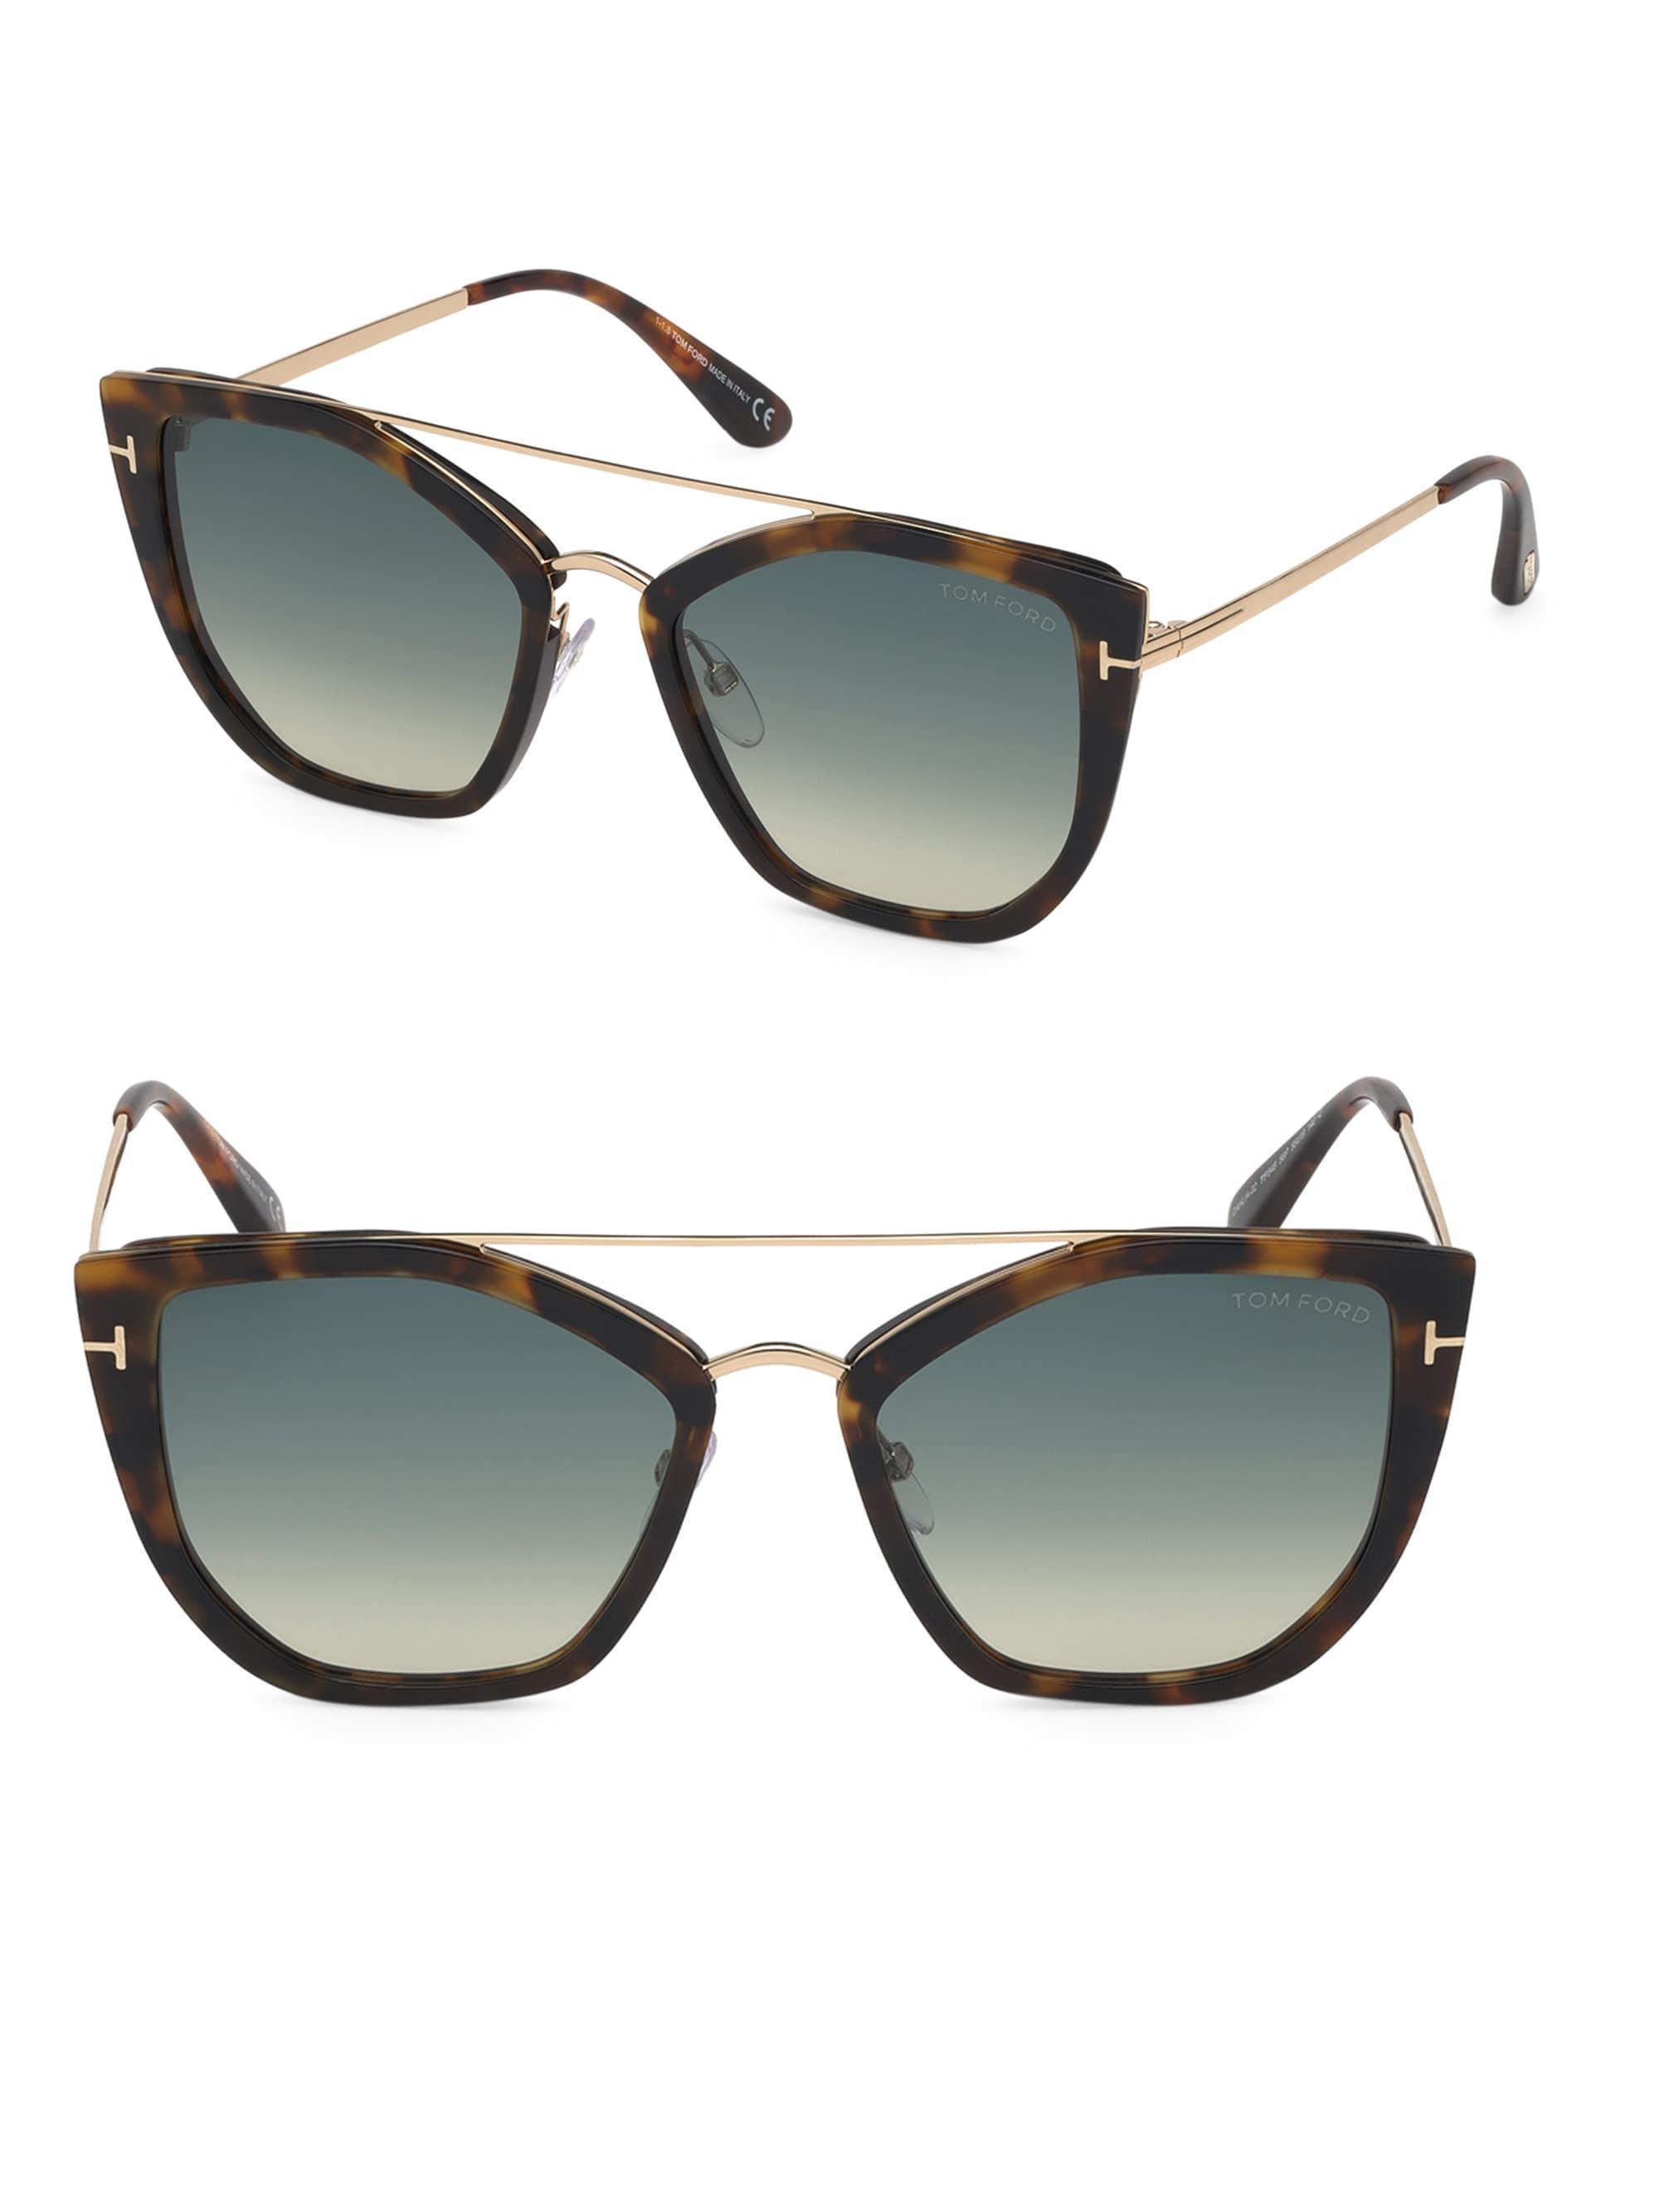 5e3d4df25a1ba Tom Ford - Gray Women s Dahlia 55mm Cat Eye Sunglasses - Brown Grey - Lyst.  View fullscreen